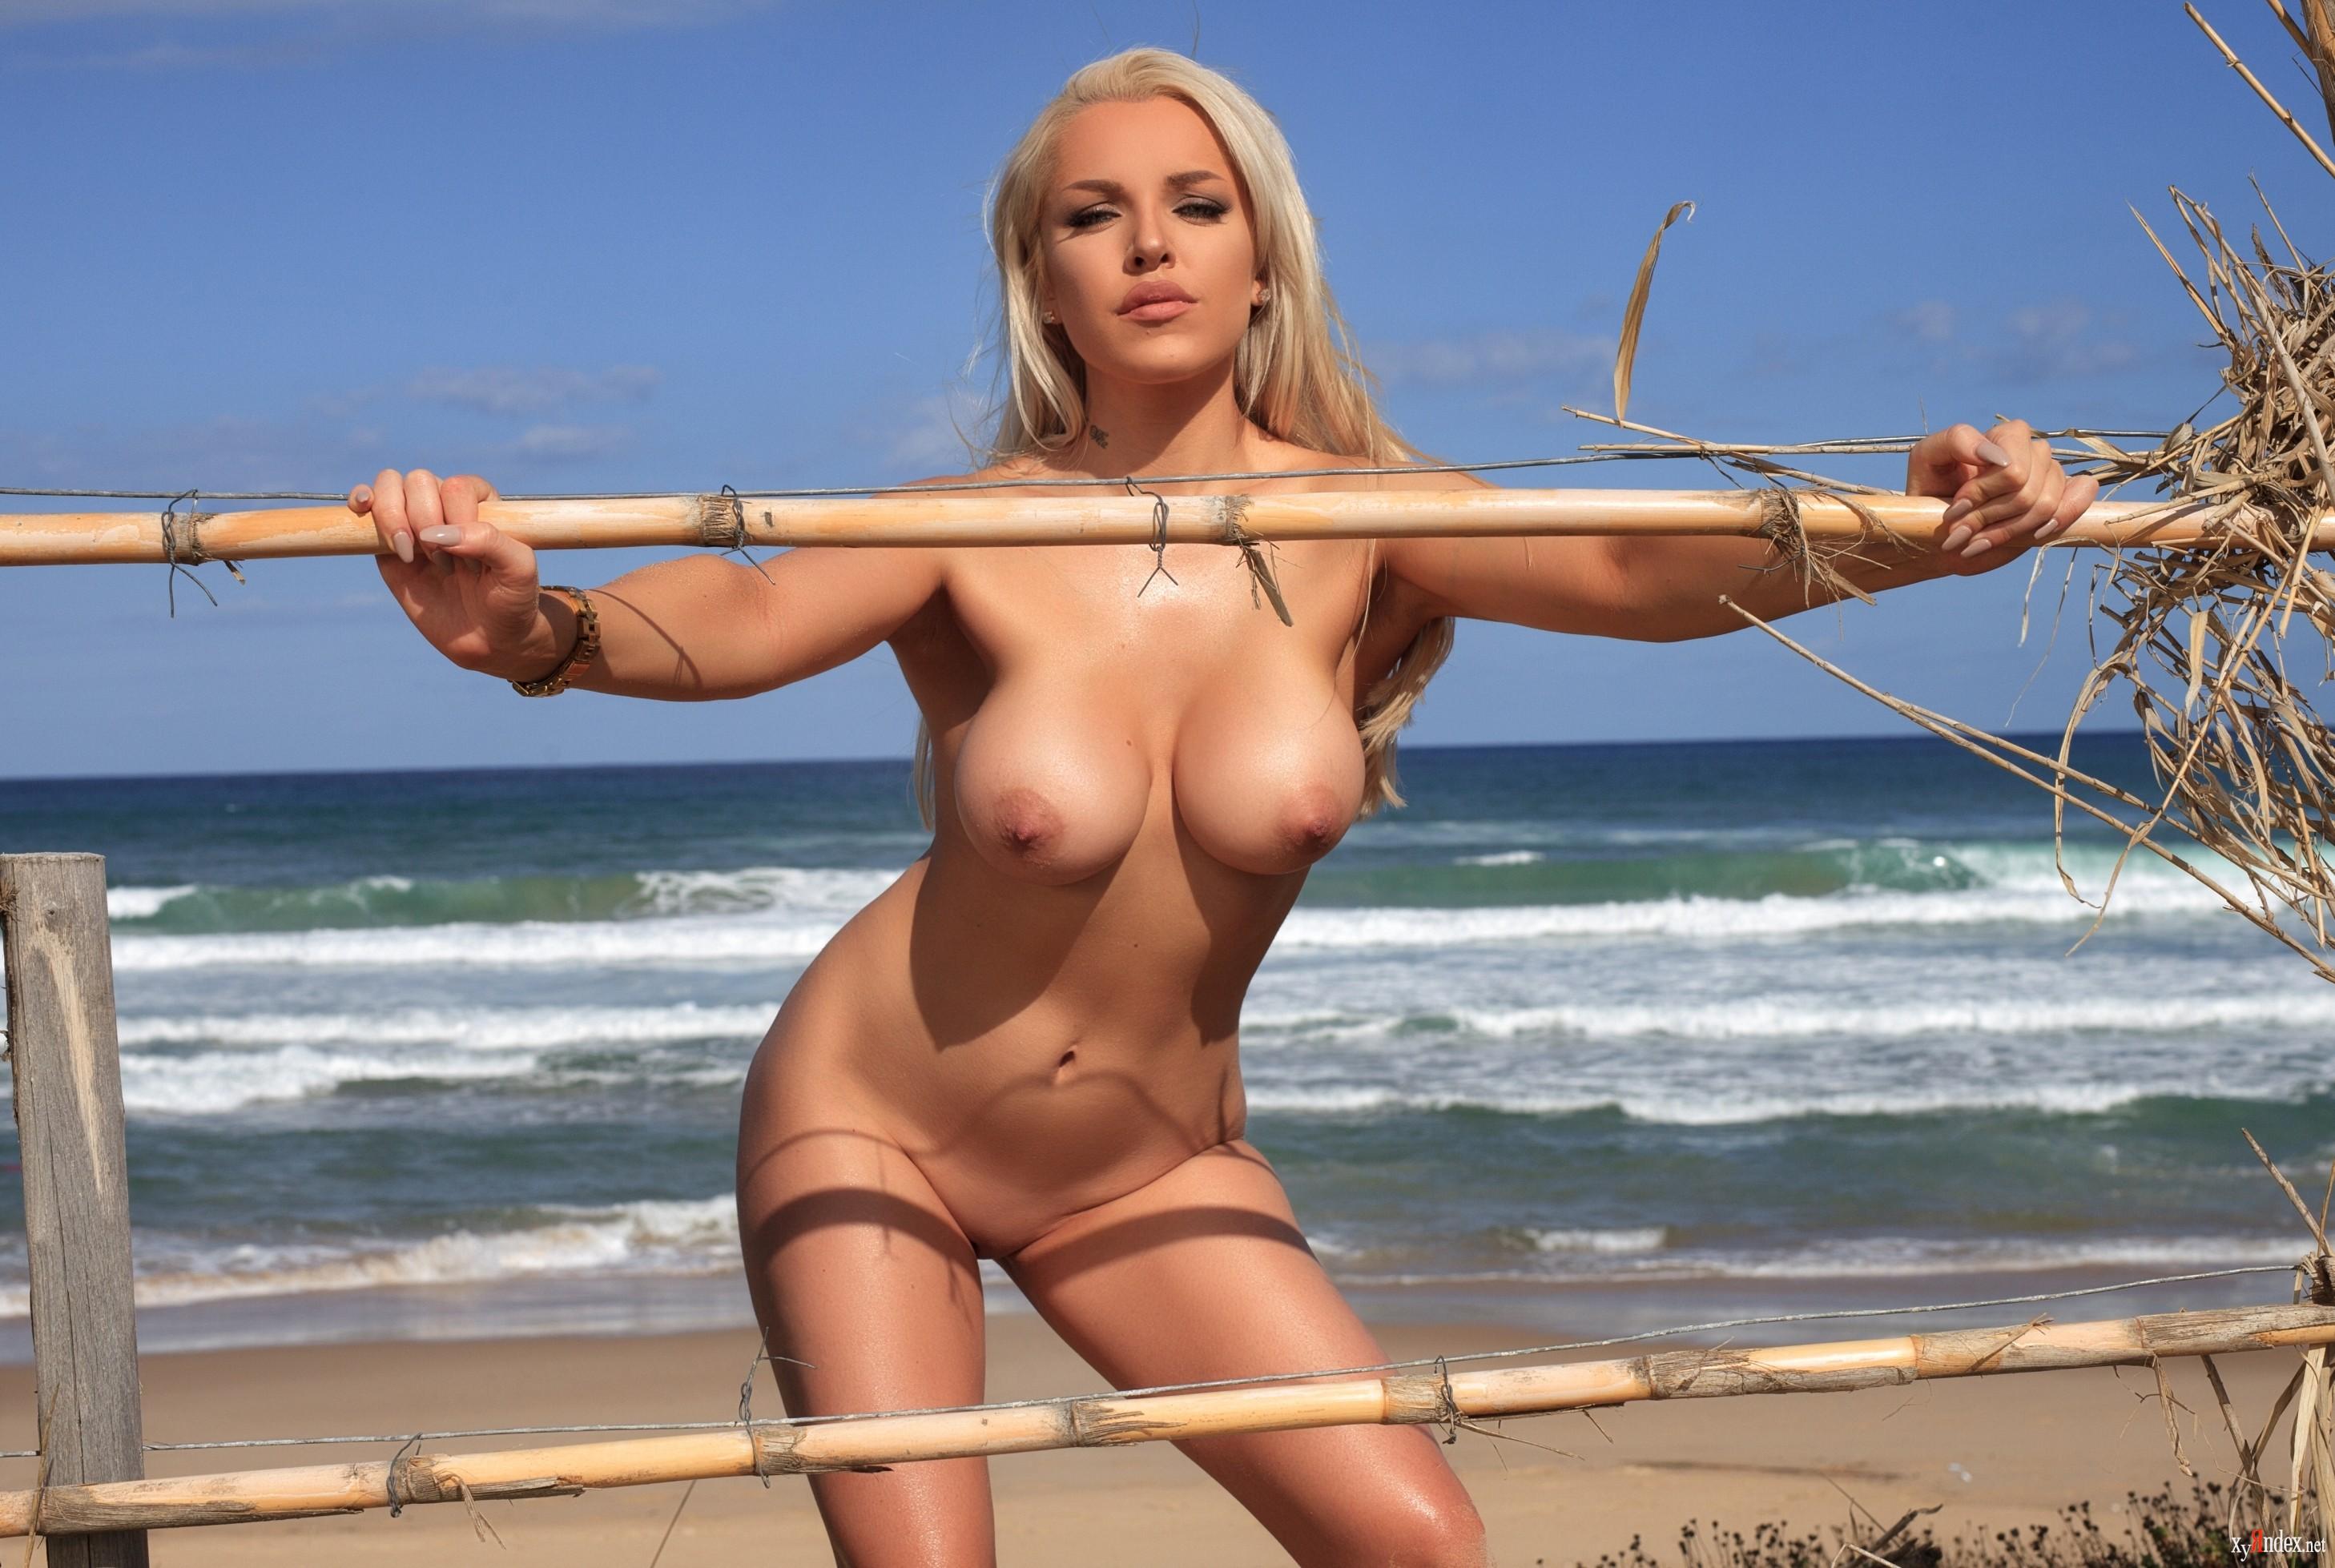 Baywatch yasmine bleeth nude